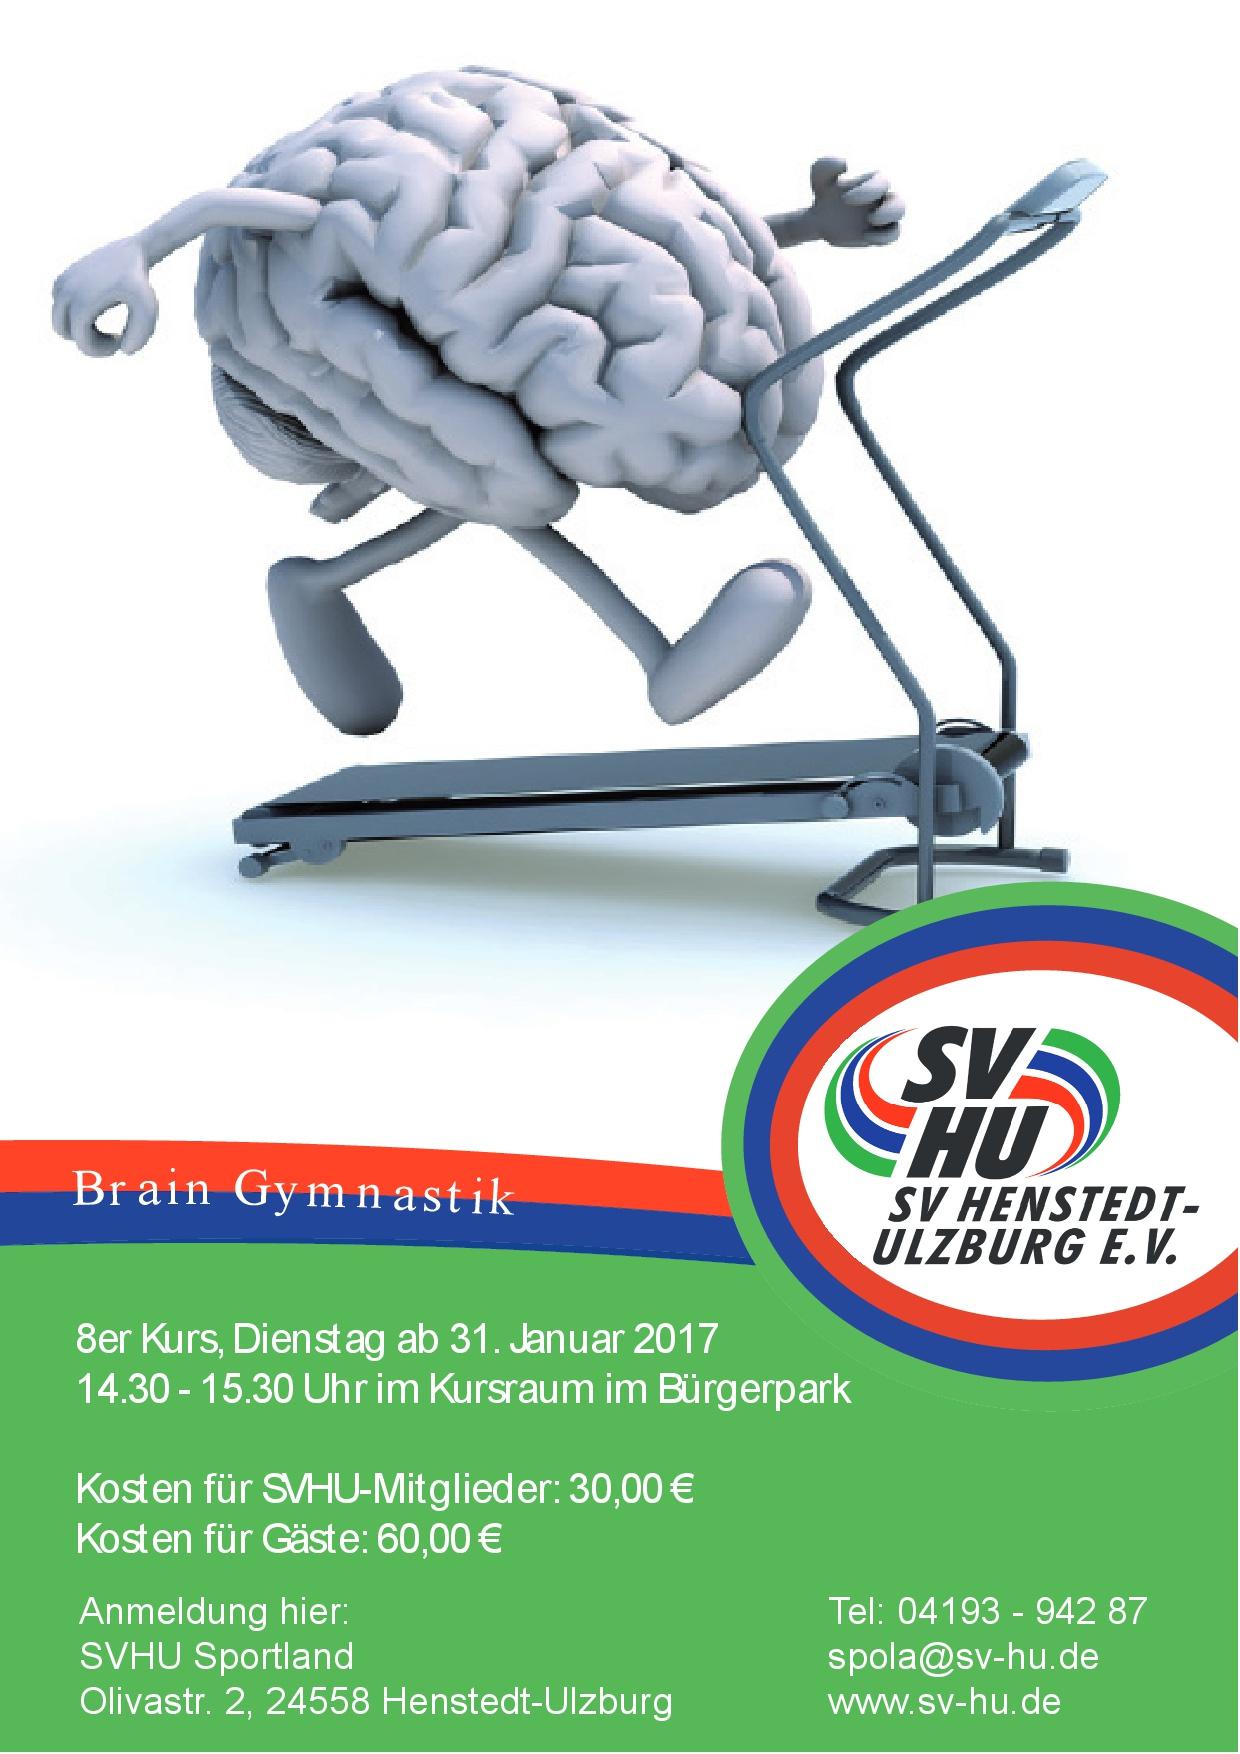 BrainGymnastik